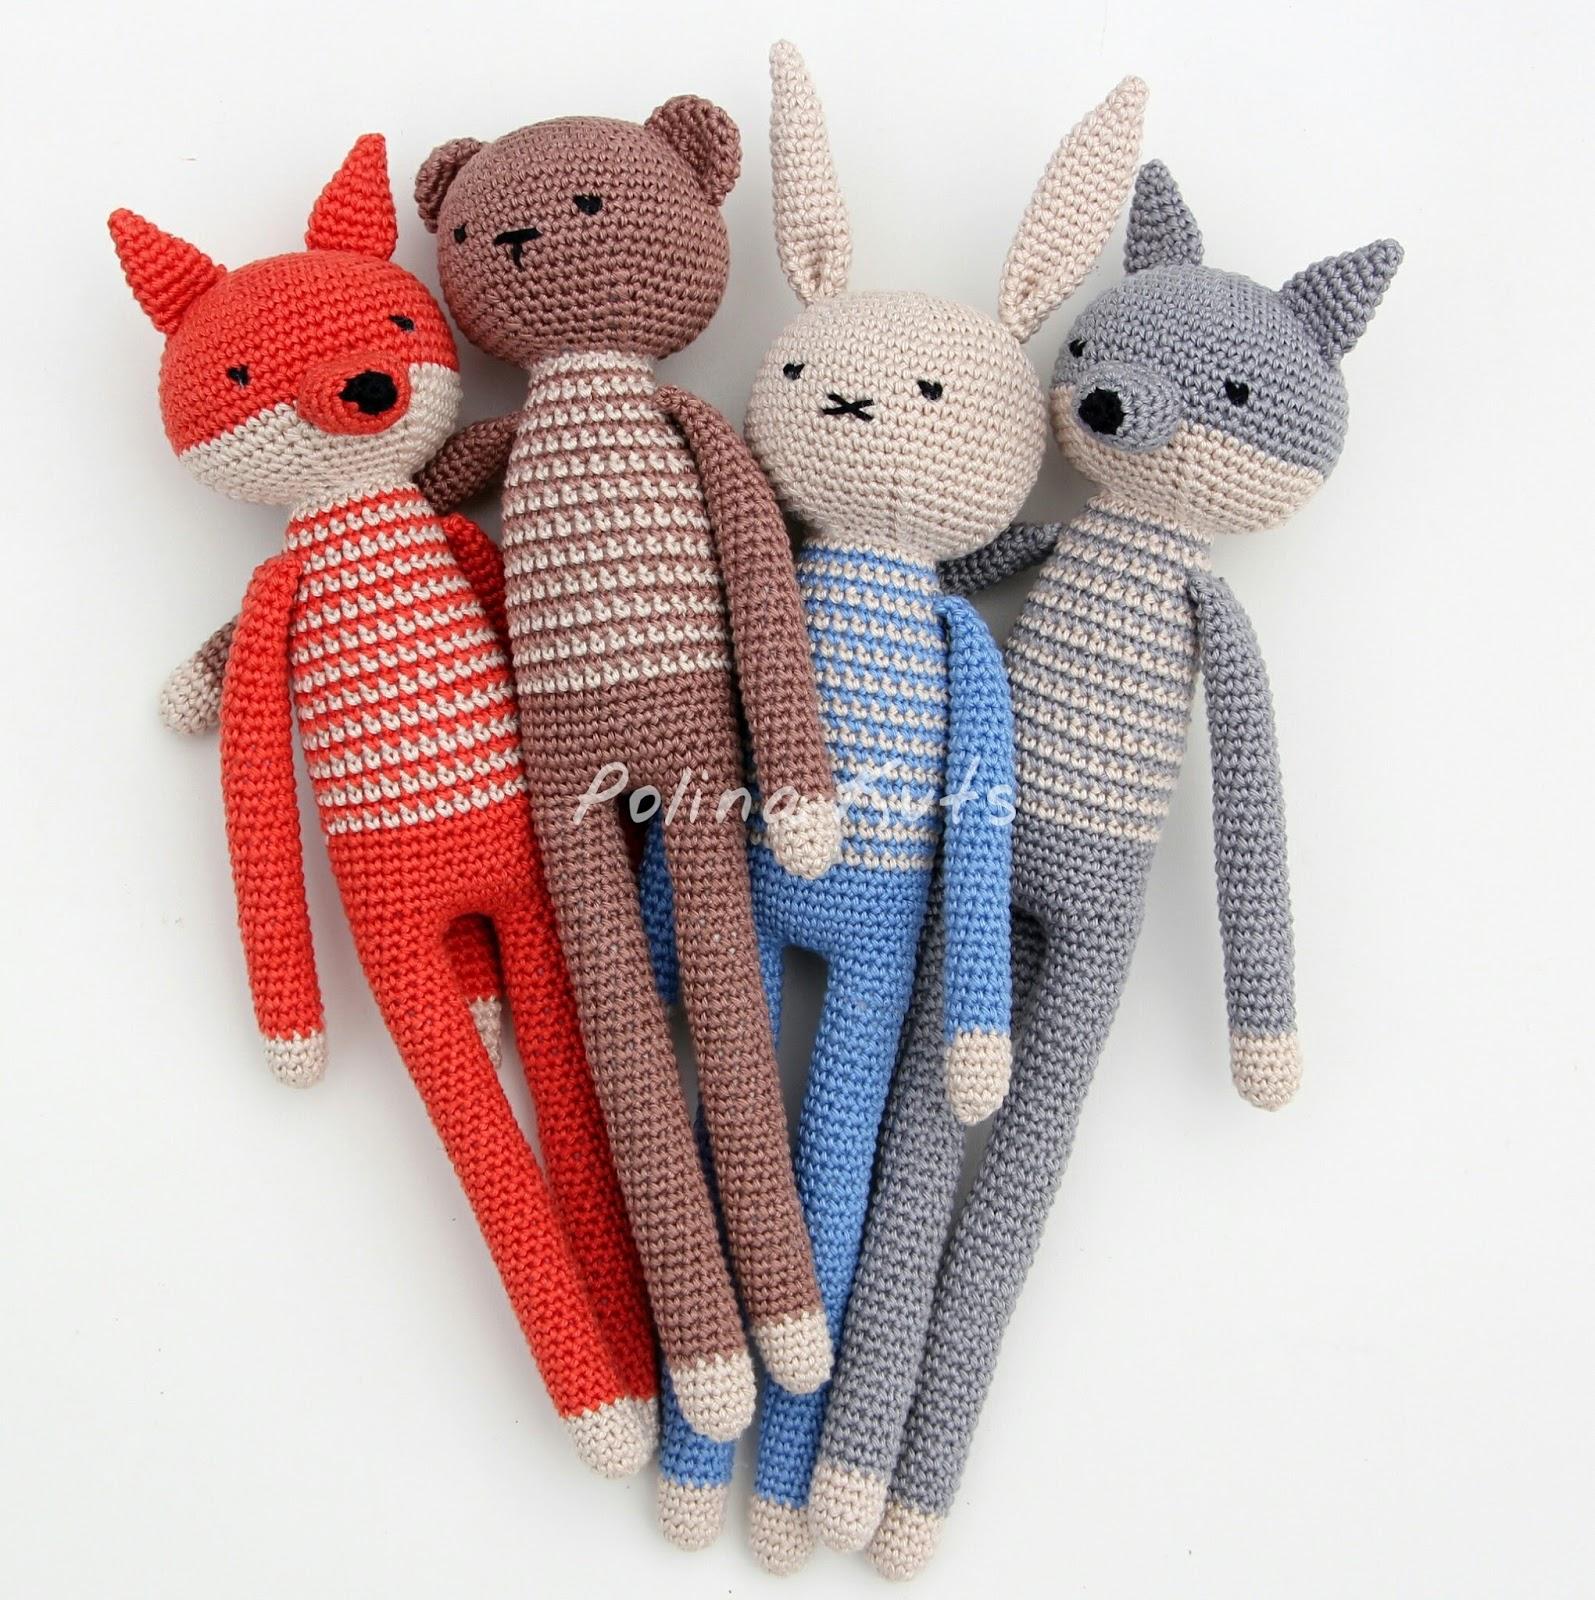 Crochet monkey patterns (With images) | Crochet monkey, Crochet ... | 1600x1595